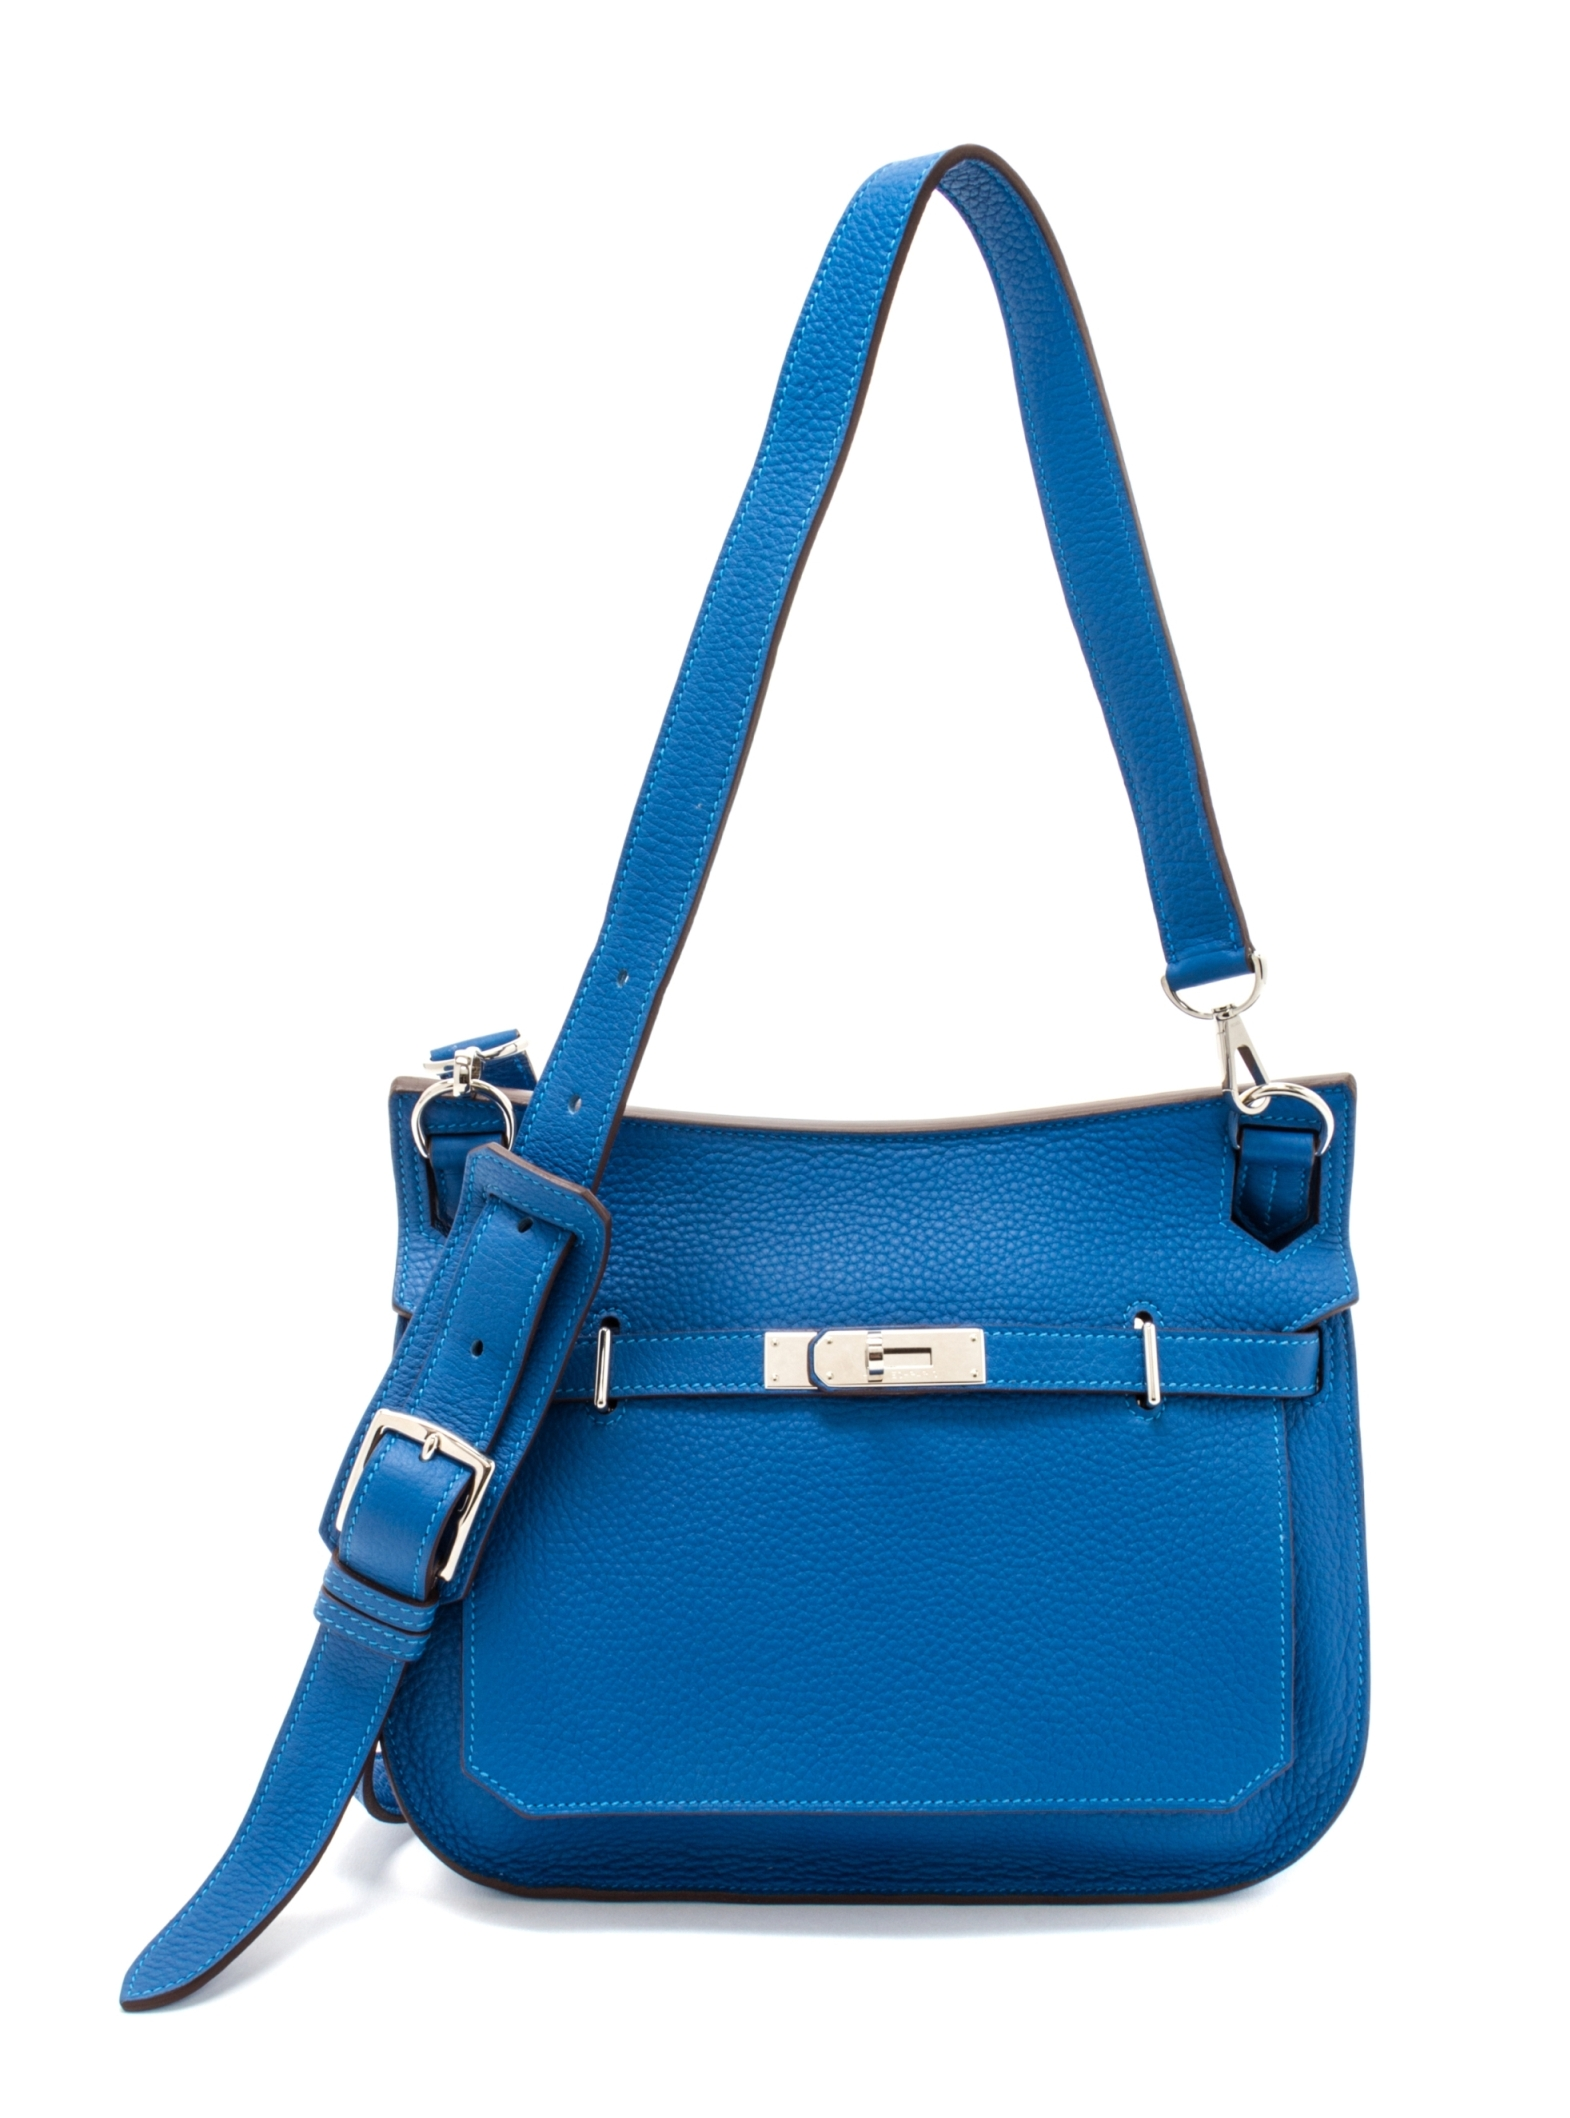 An Hermes Mykonos Taurillon Clemence 28cm Jypsiere Handbag, Summer ...